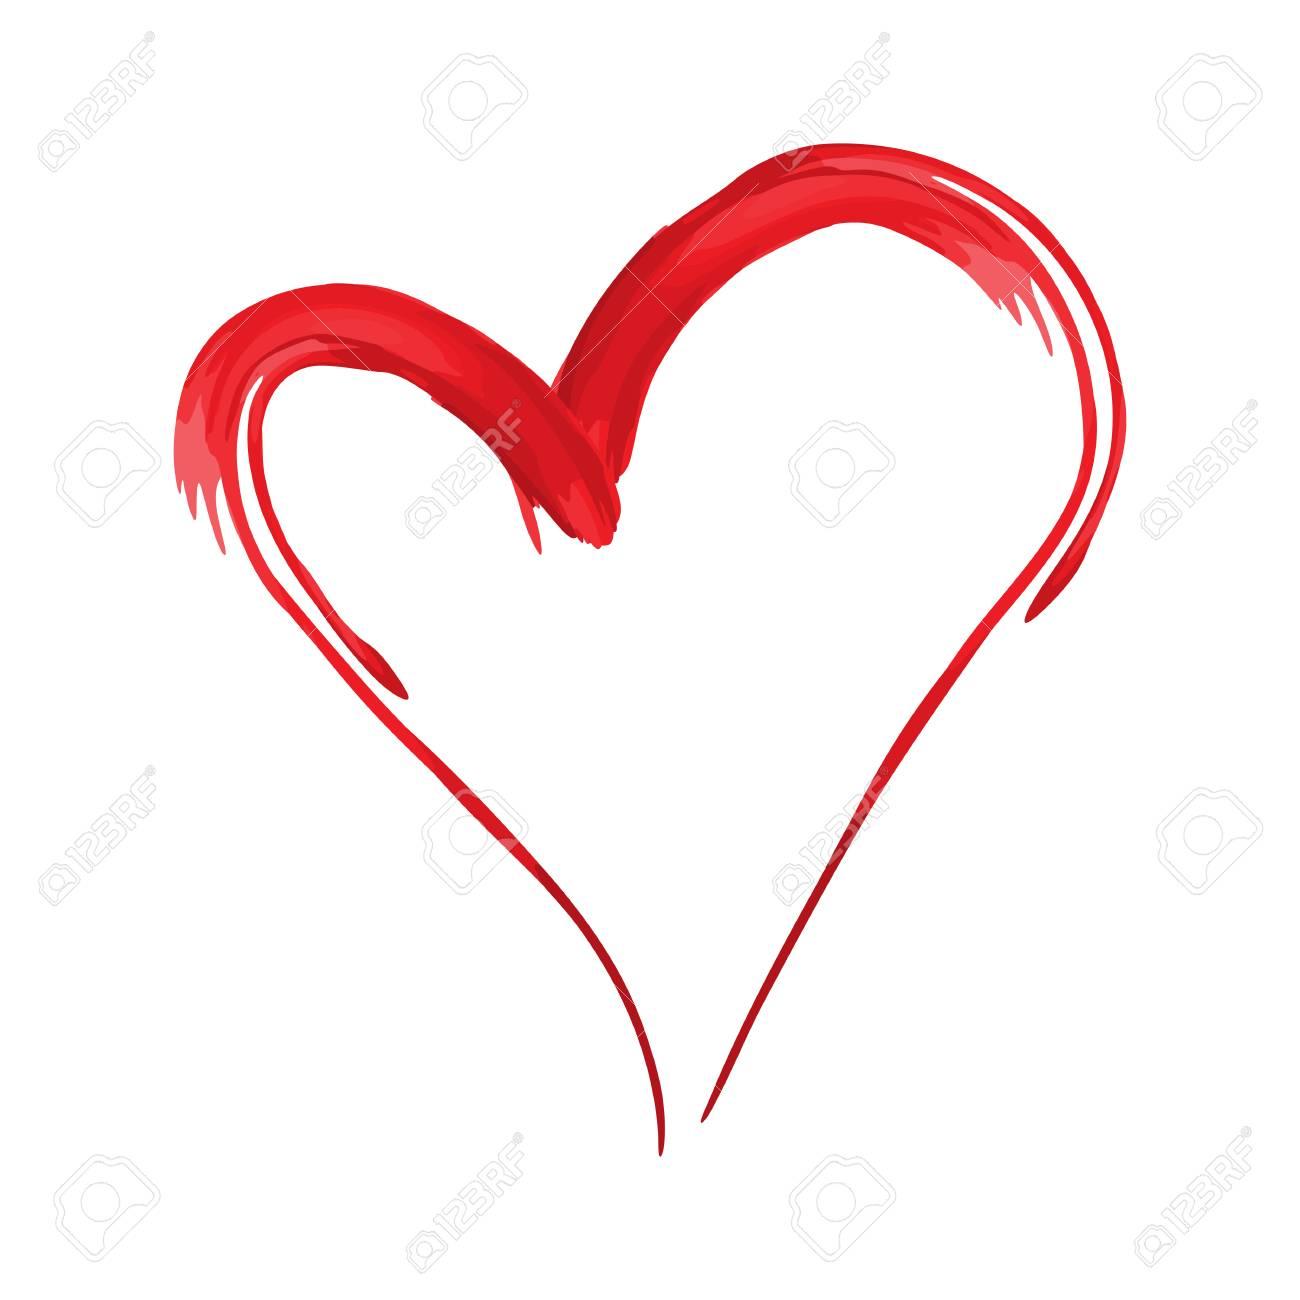 heart shape design for love symbols valentine s day royalty free rh 123rf com vector heart shape illustrator free download vector heart shape illustrator